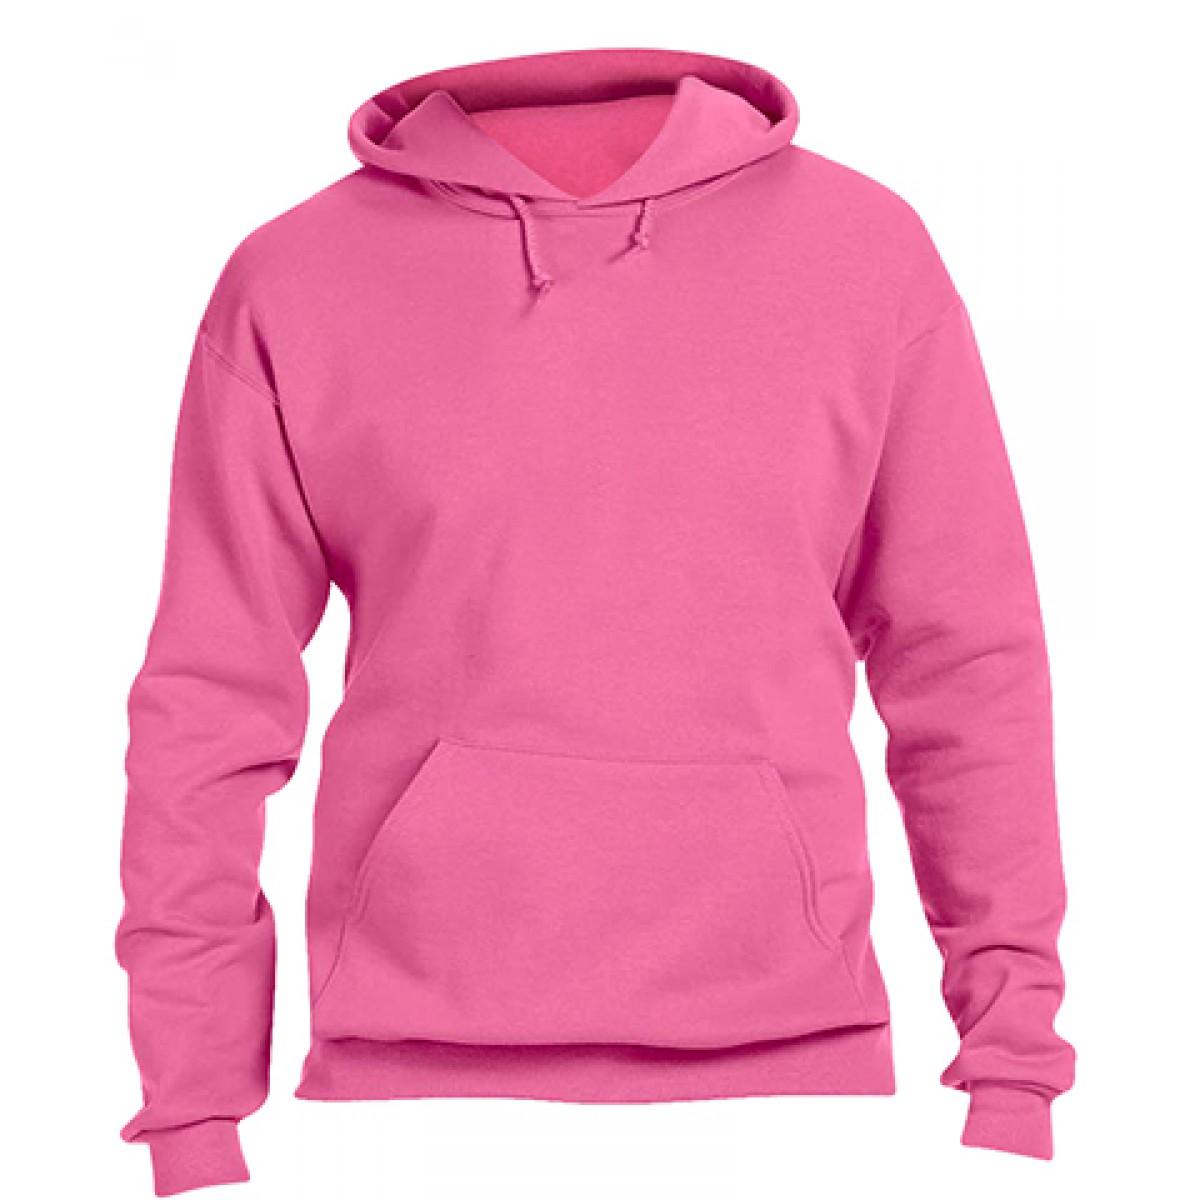 Pullover Hood 50/50 Preshrunk Fleece-Neon-Pink-3XL